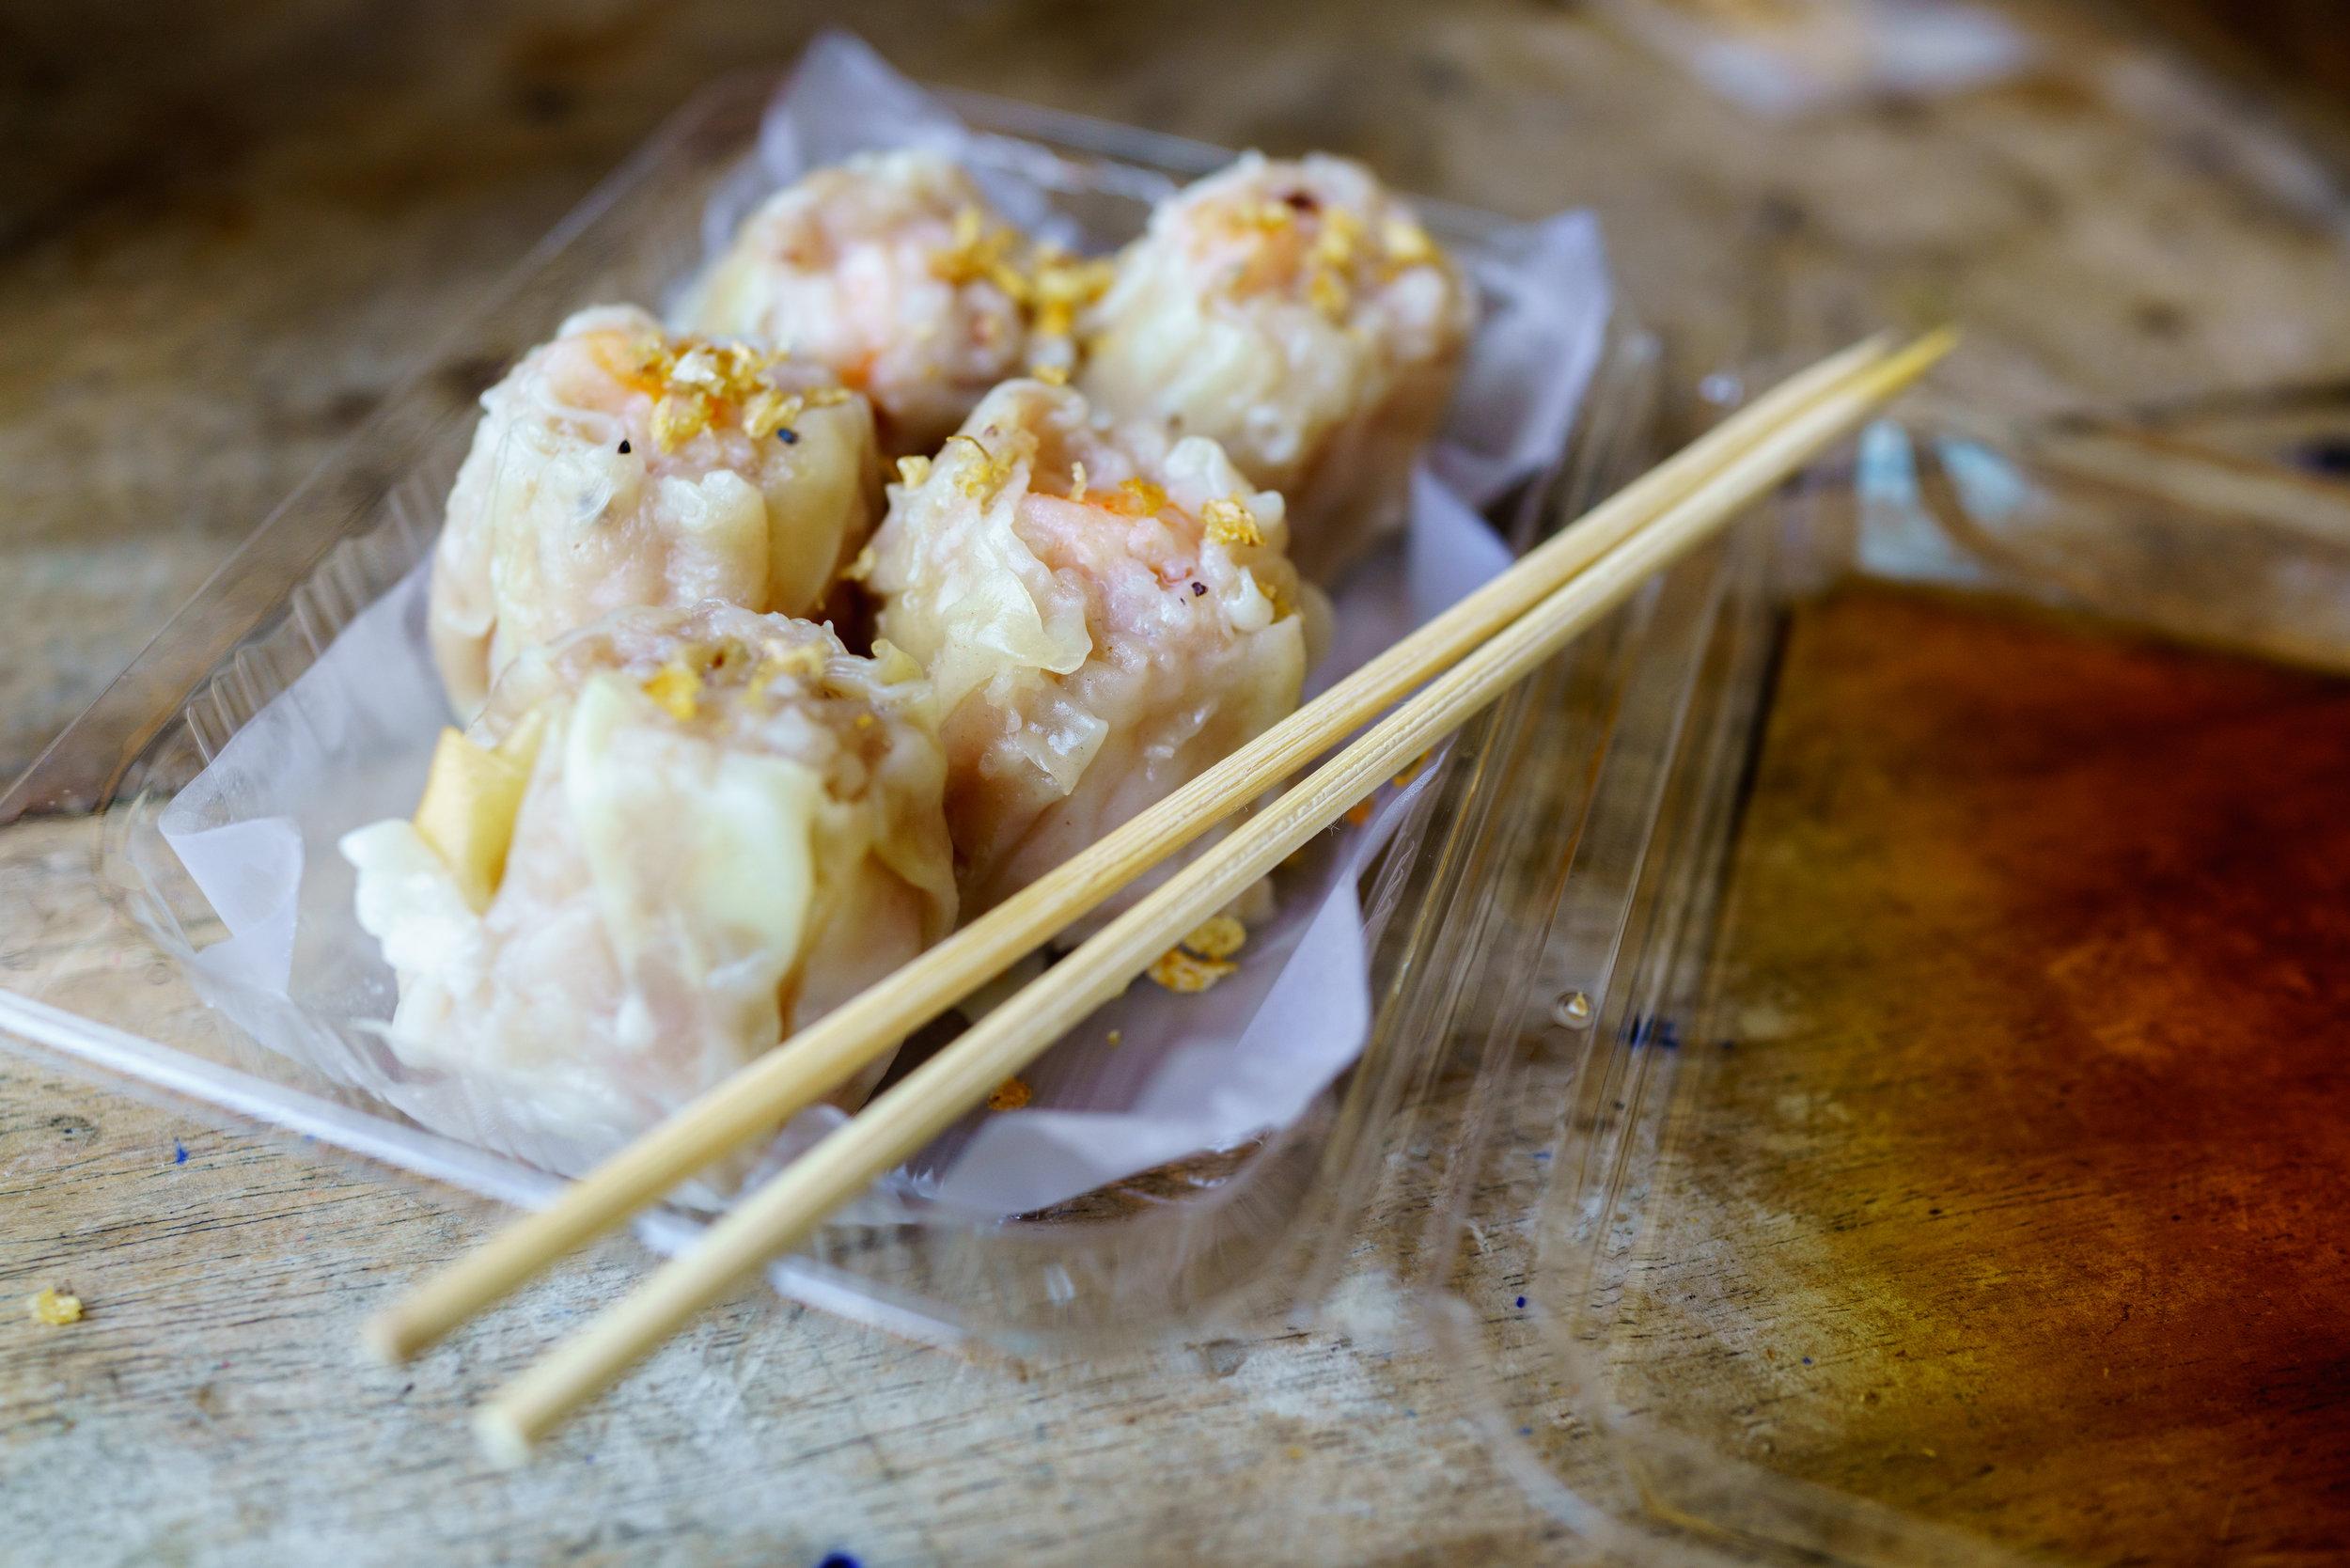 Pork and shrimp dumplings - quick and delicious